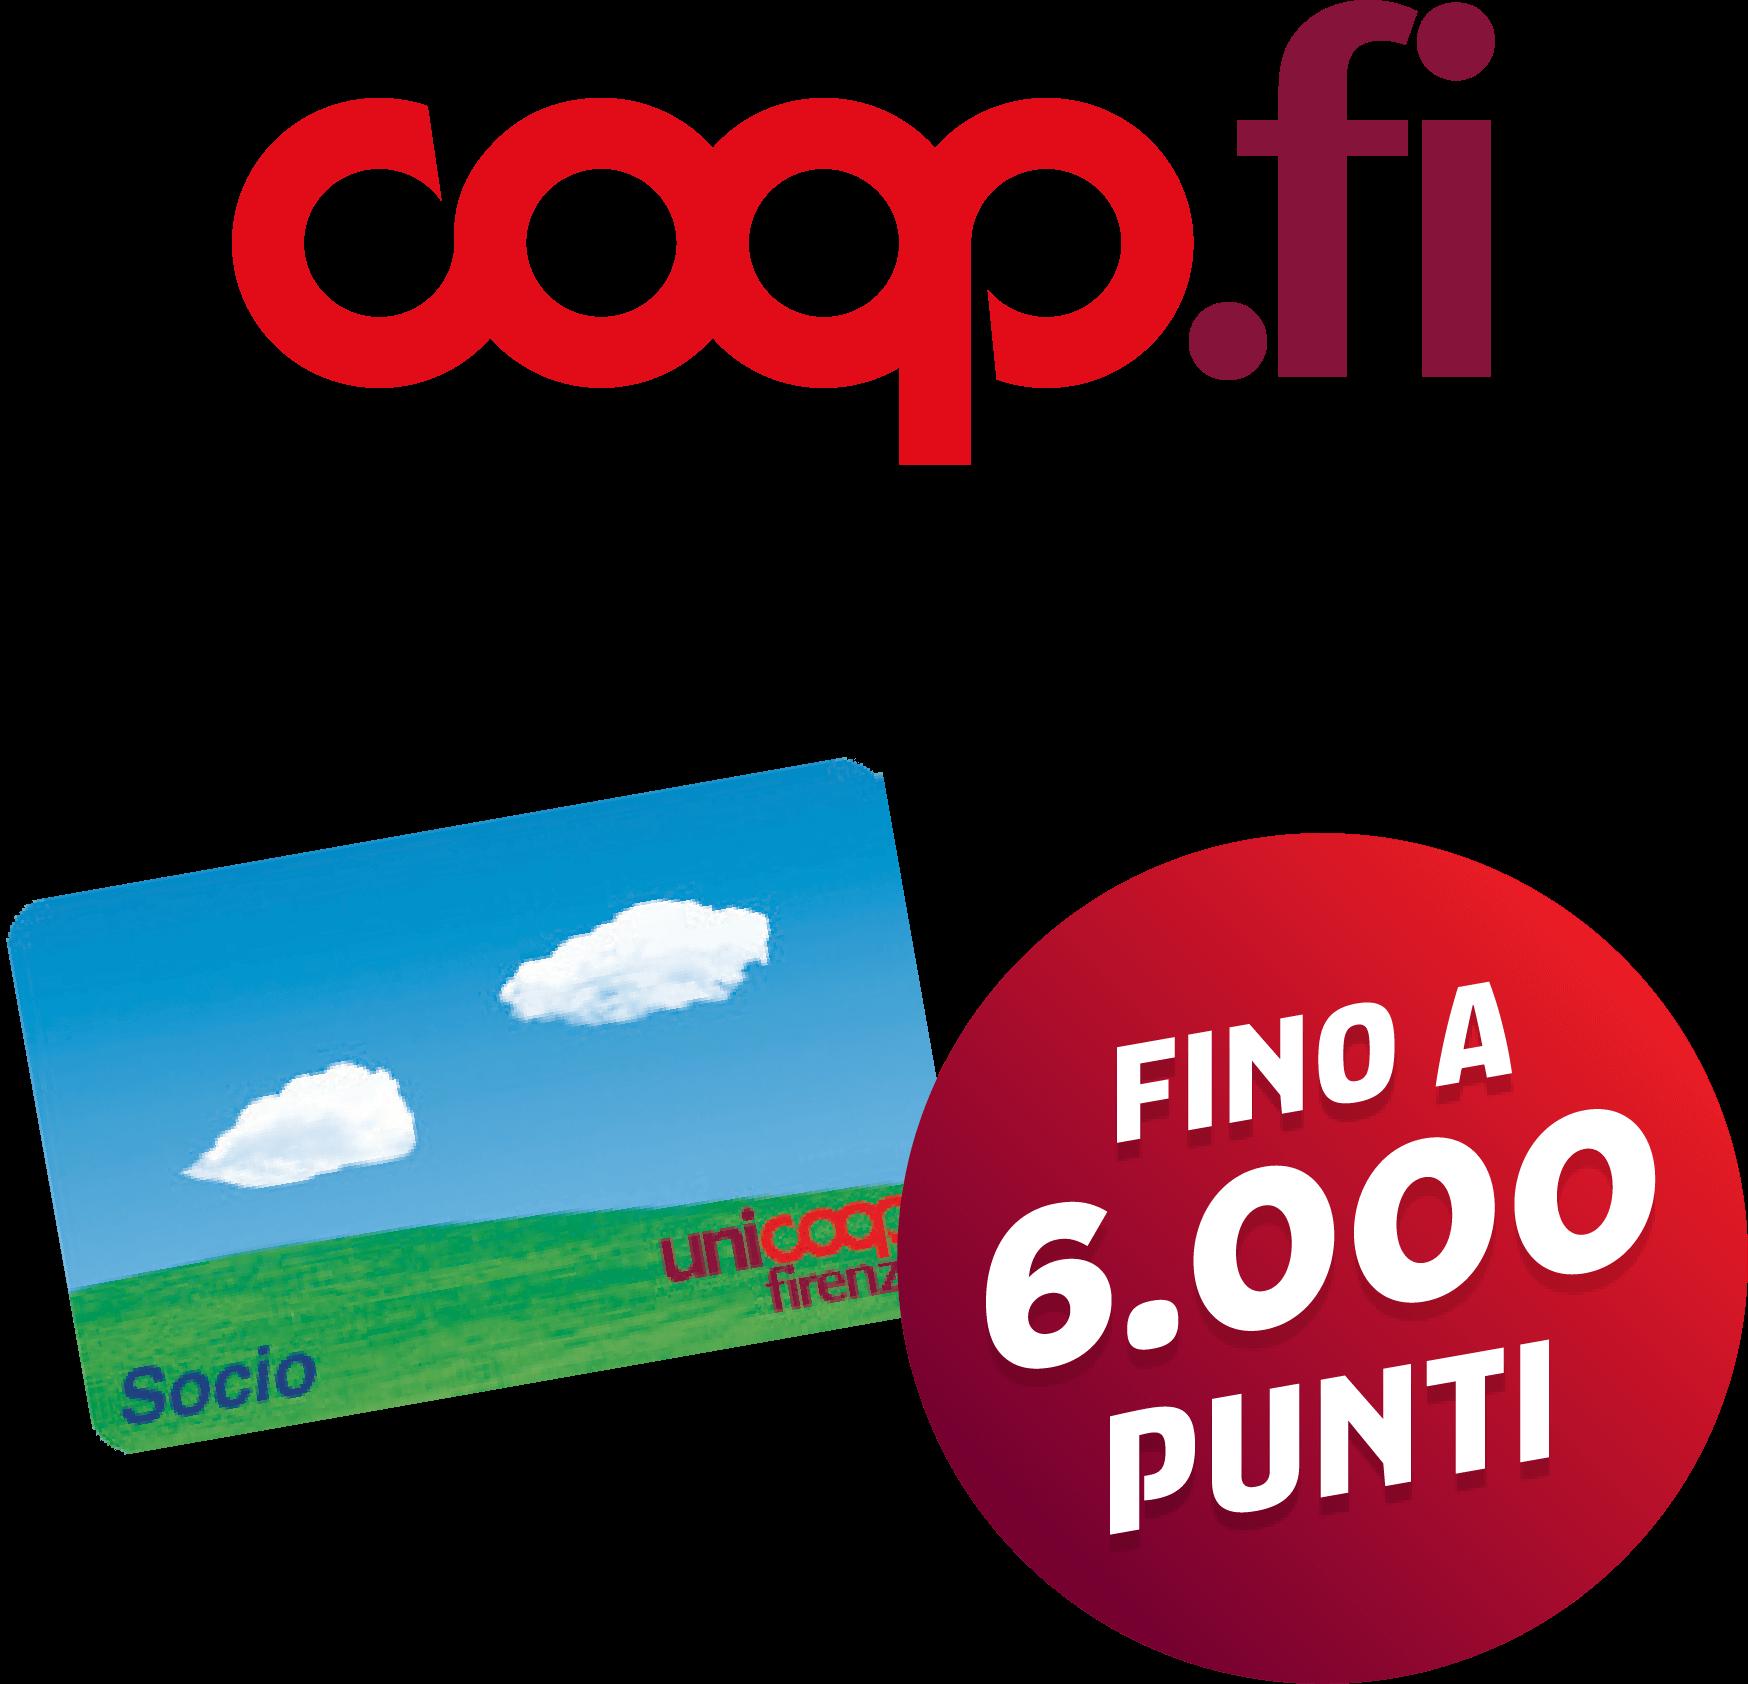 promozione coop 6000 punti